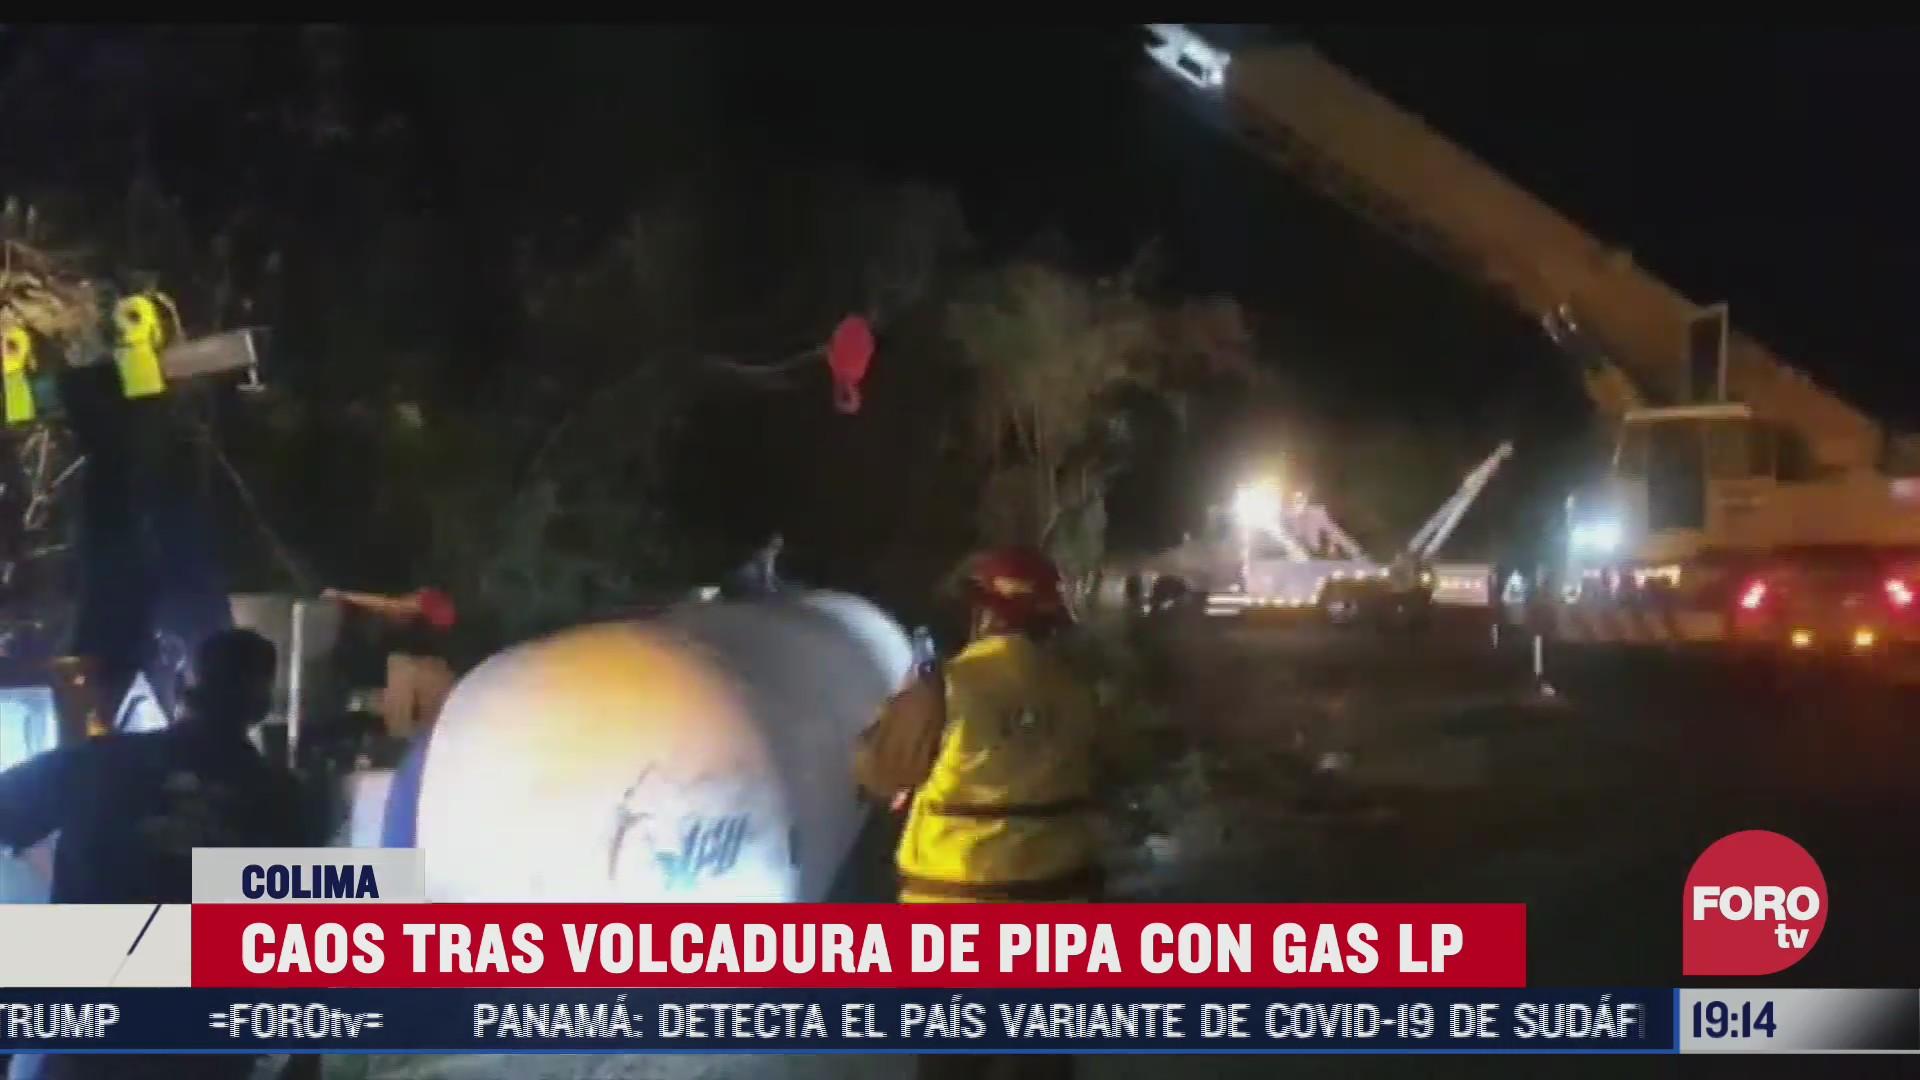 caos tras volcadura de pipa con gas lp en colima